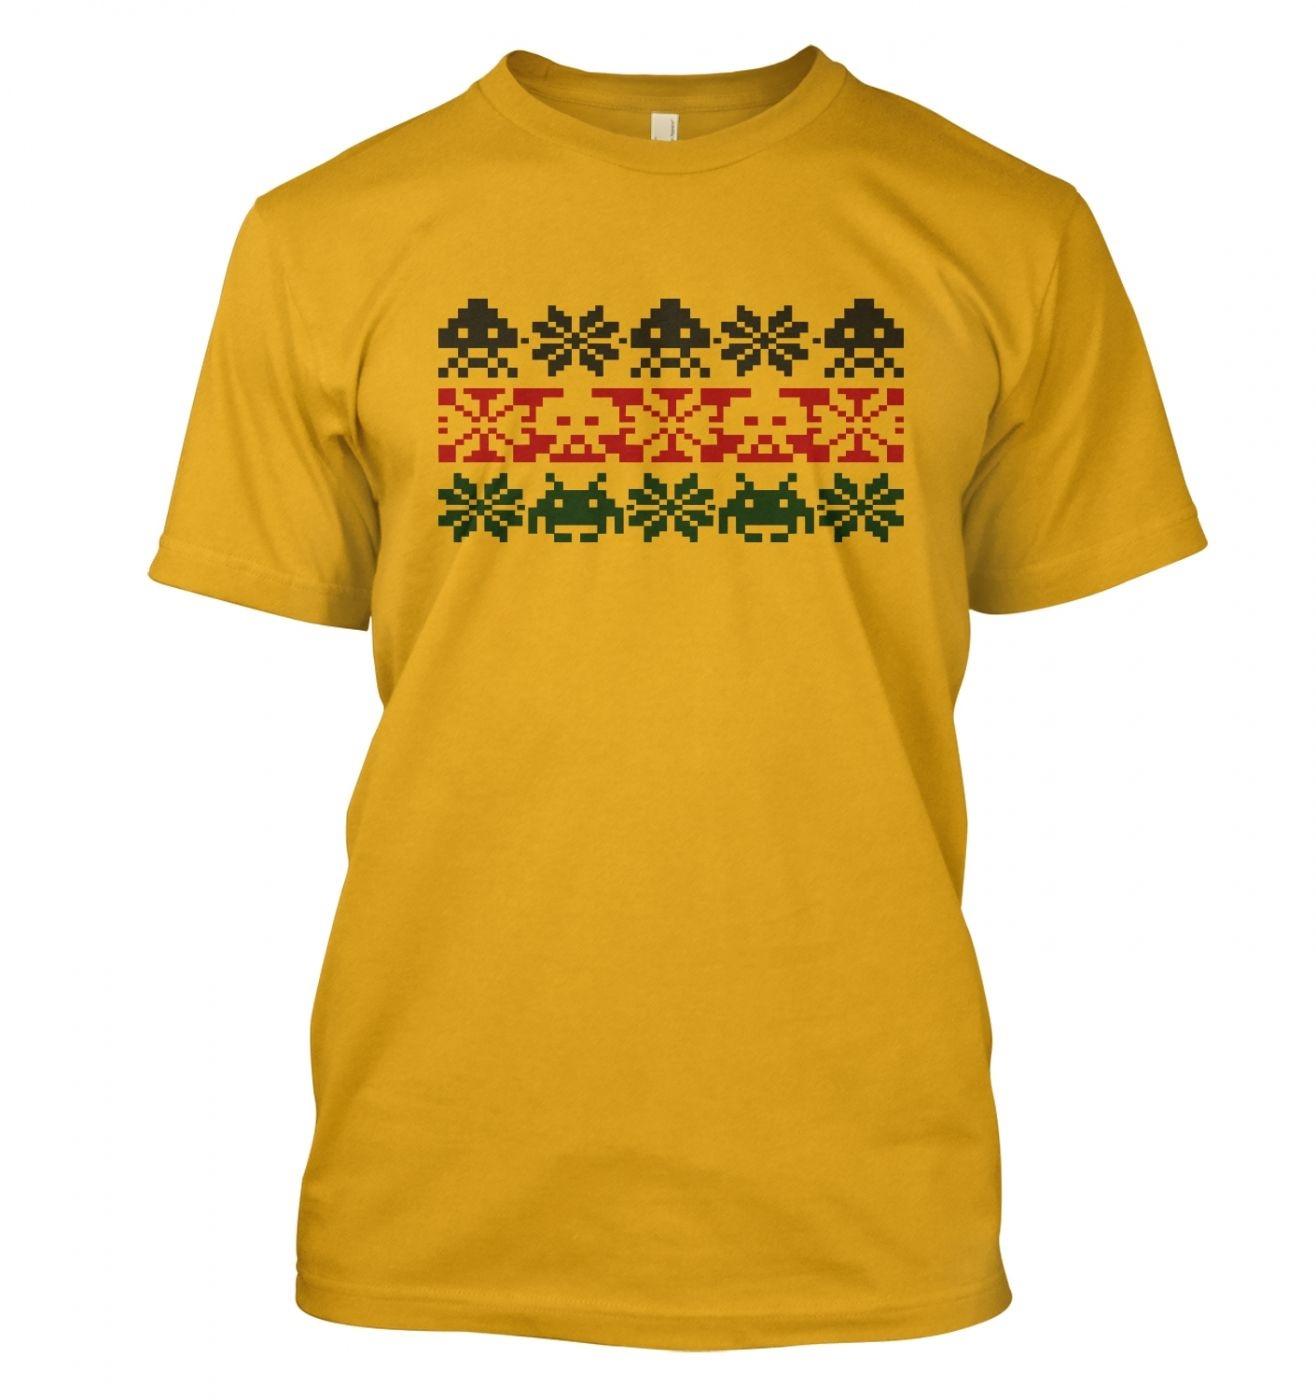 Isle Invaders men's t-shirt